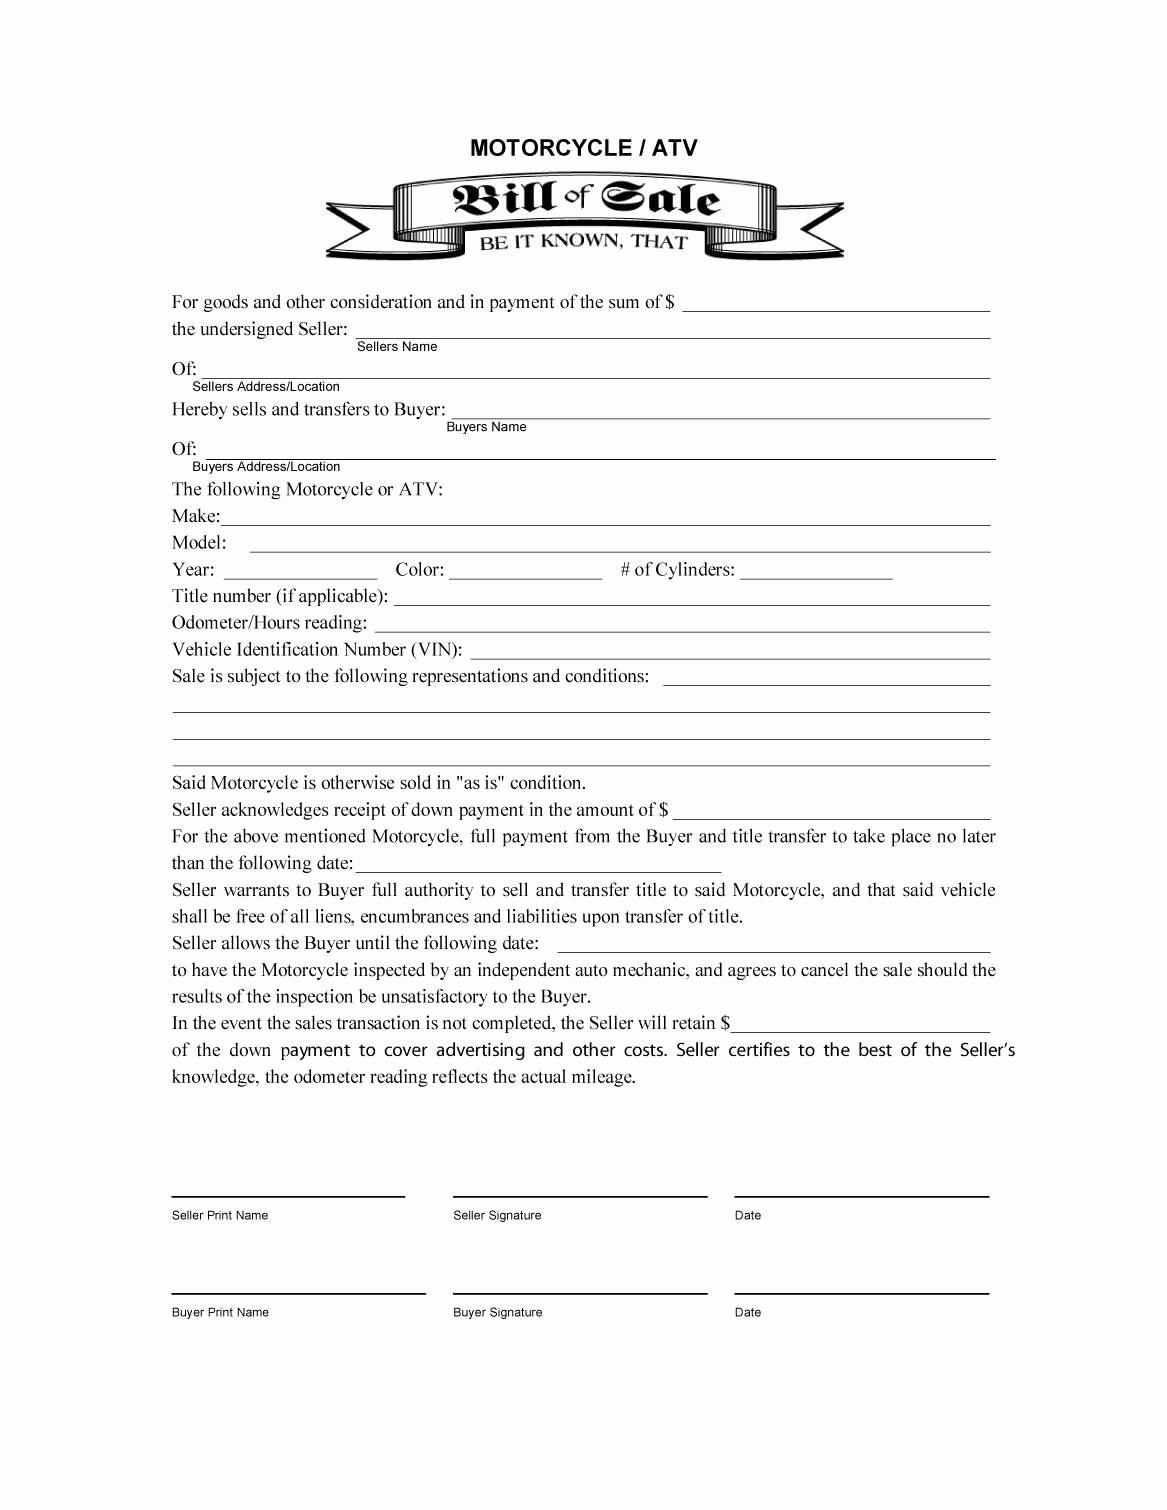 Print Free Bill Of Sale New 45 Fee Printable Bill Of Sale Templates Car Boat Gun